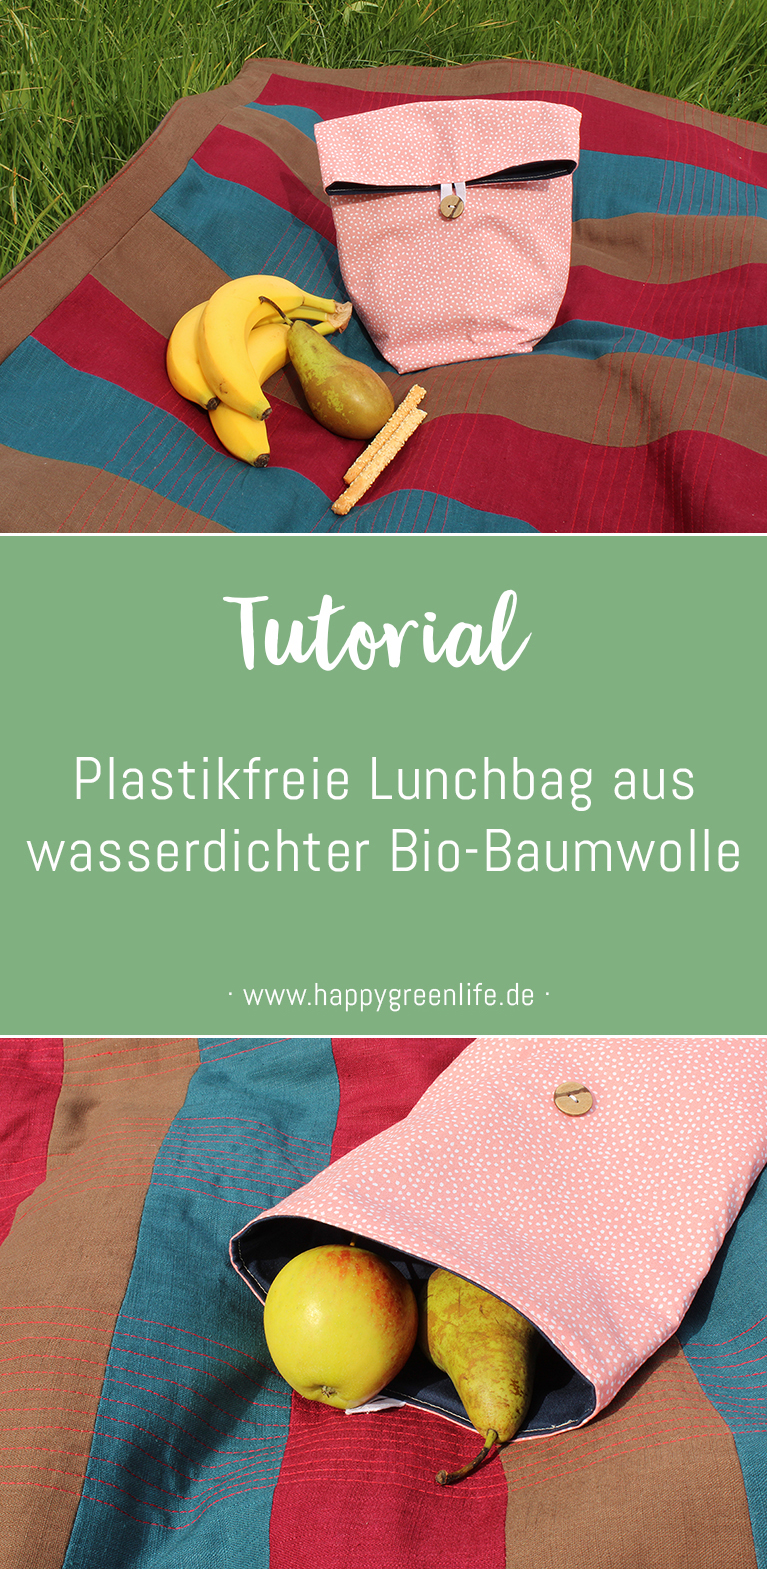 Lunchbag nähen, um Plastikmüll zu vermeiden